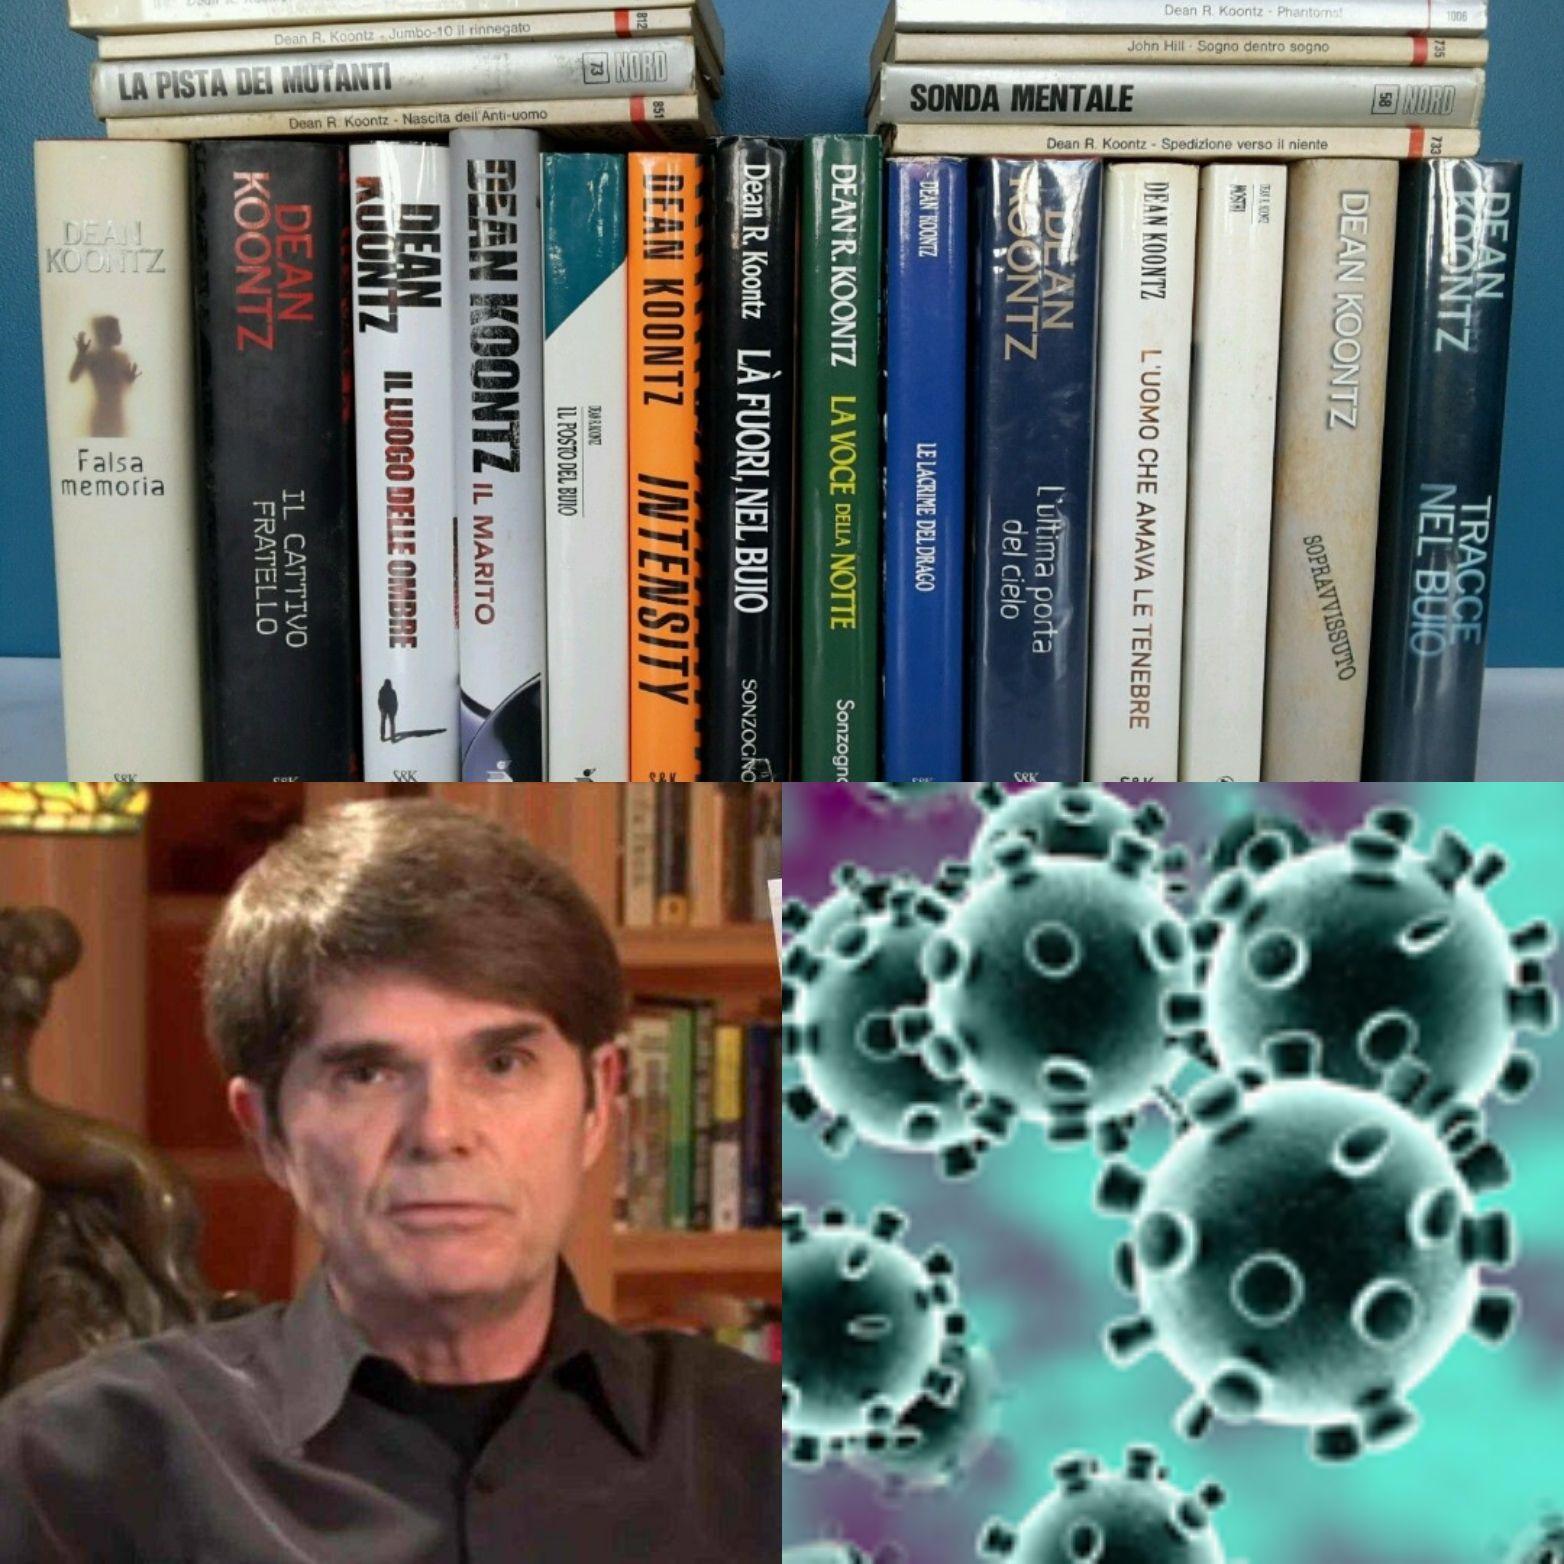 Dean Koontz: 22 prime edizioni in vendita in blocco su eBay a 8 € l'una!